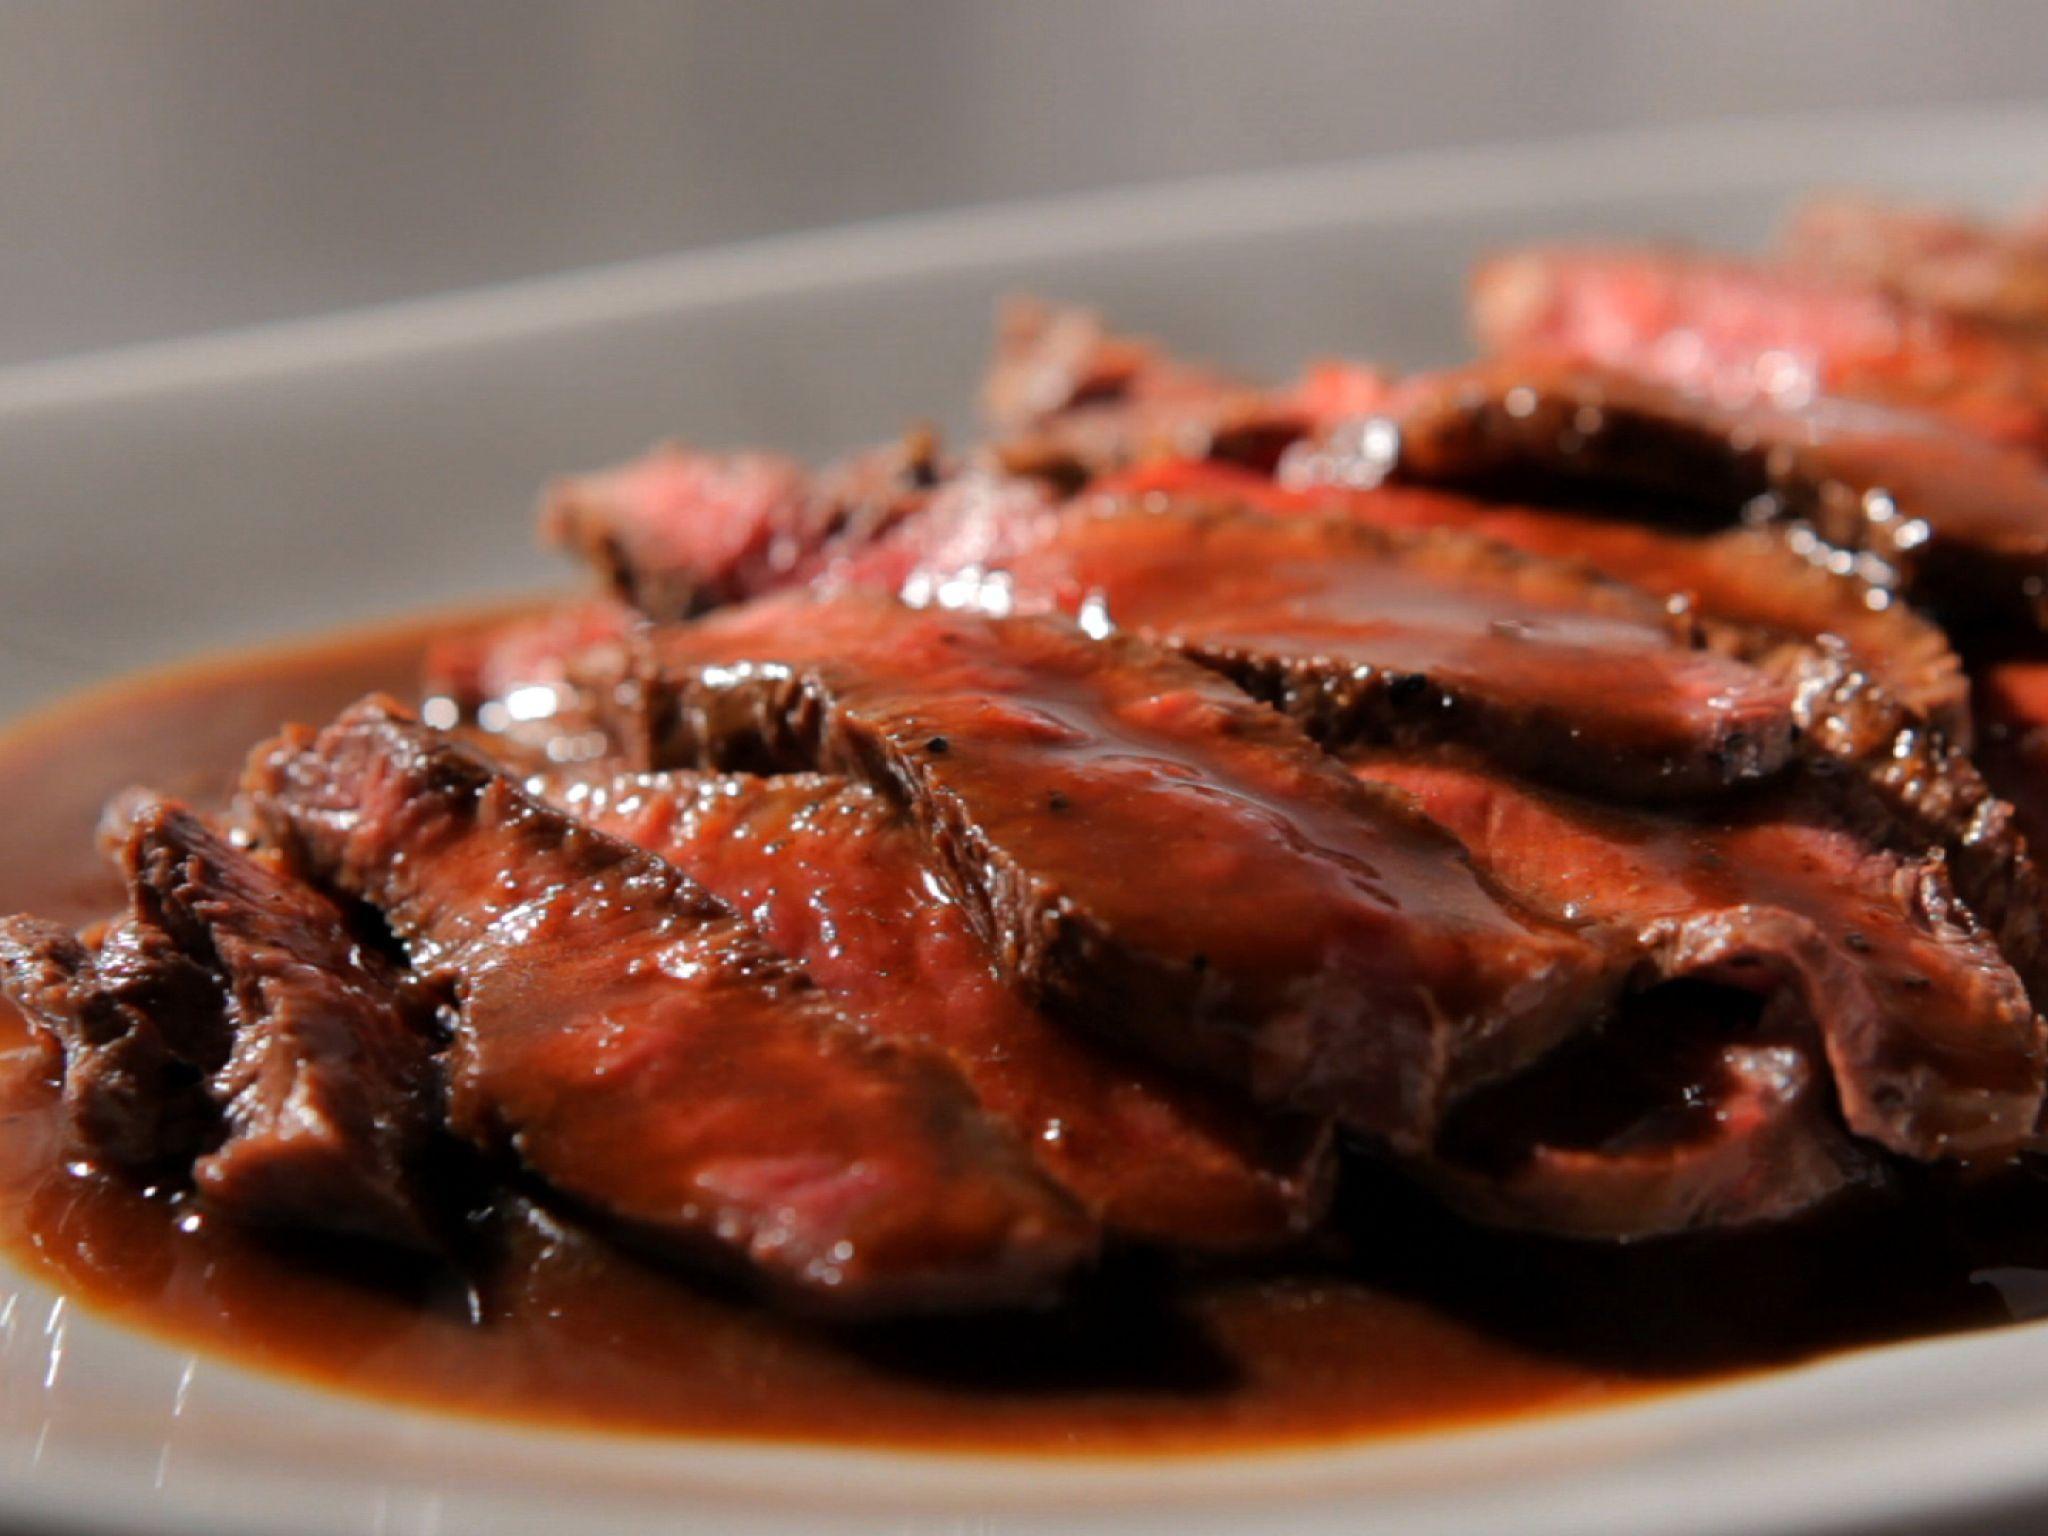 Flat Iron Steak With Cabernet Sauce Recipe Cabernet Sauce Recipe Flat Iron Steak Food Network Recipes